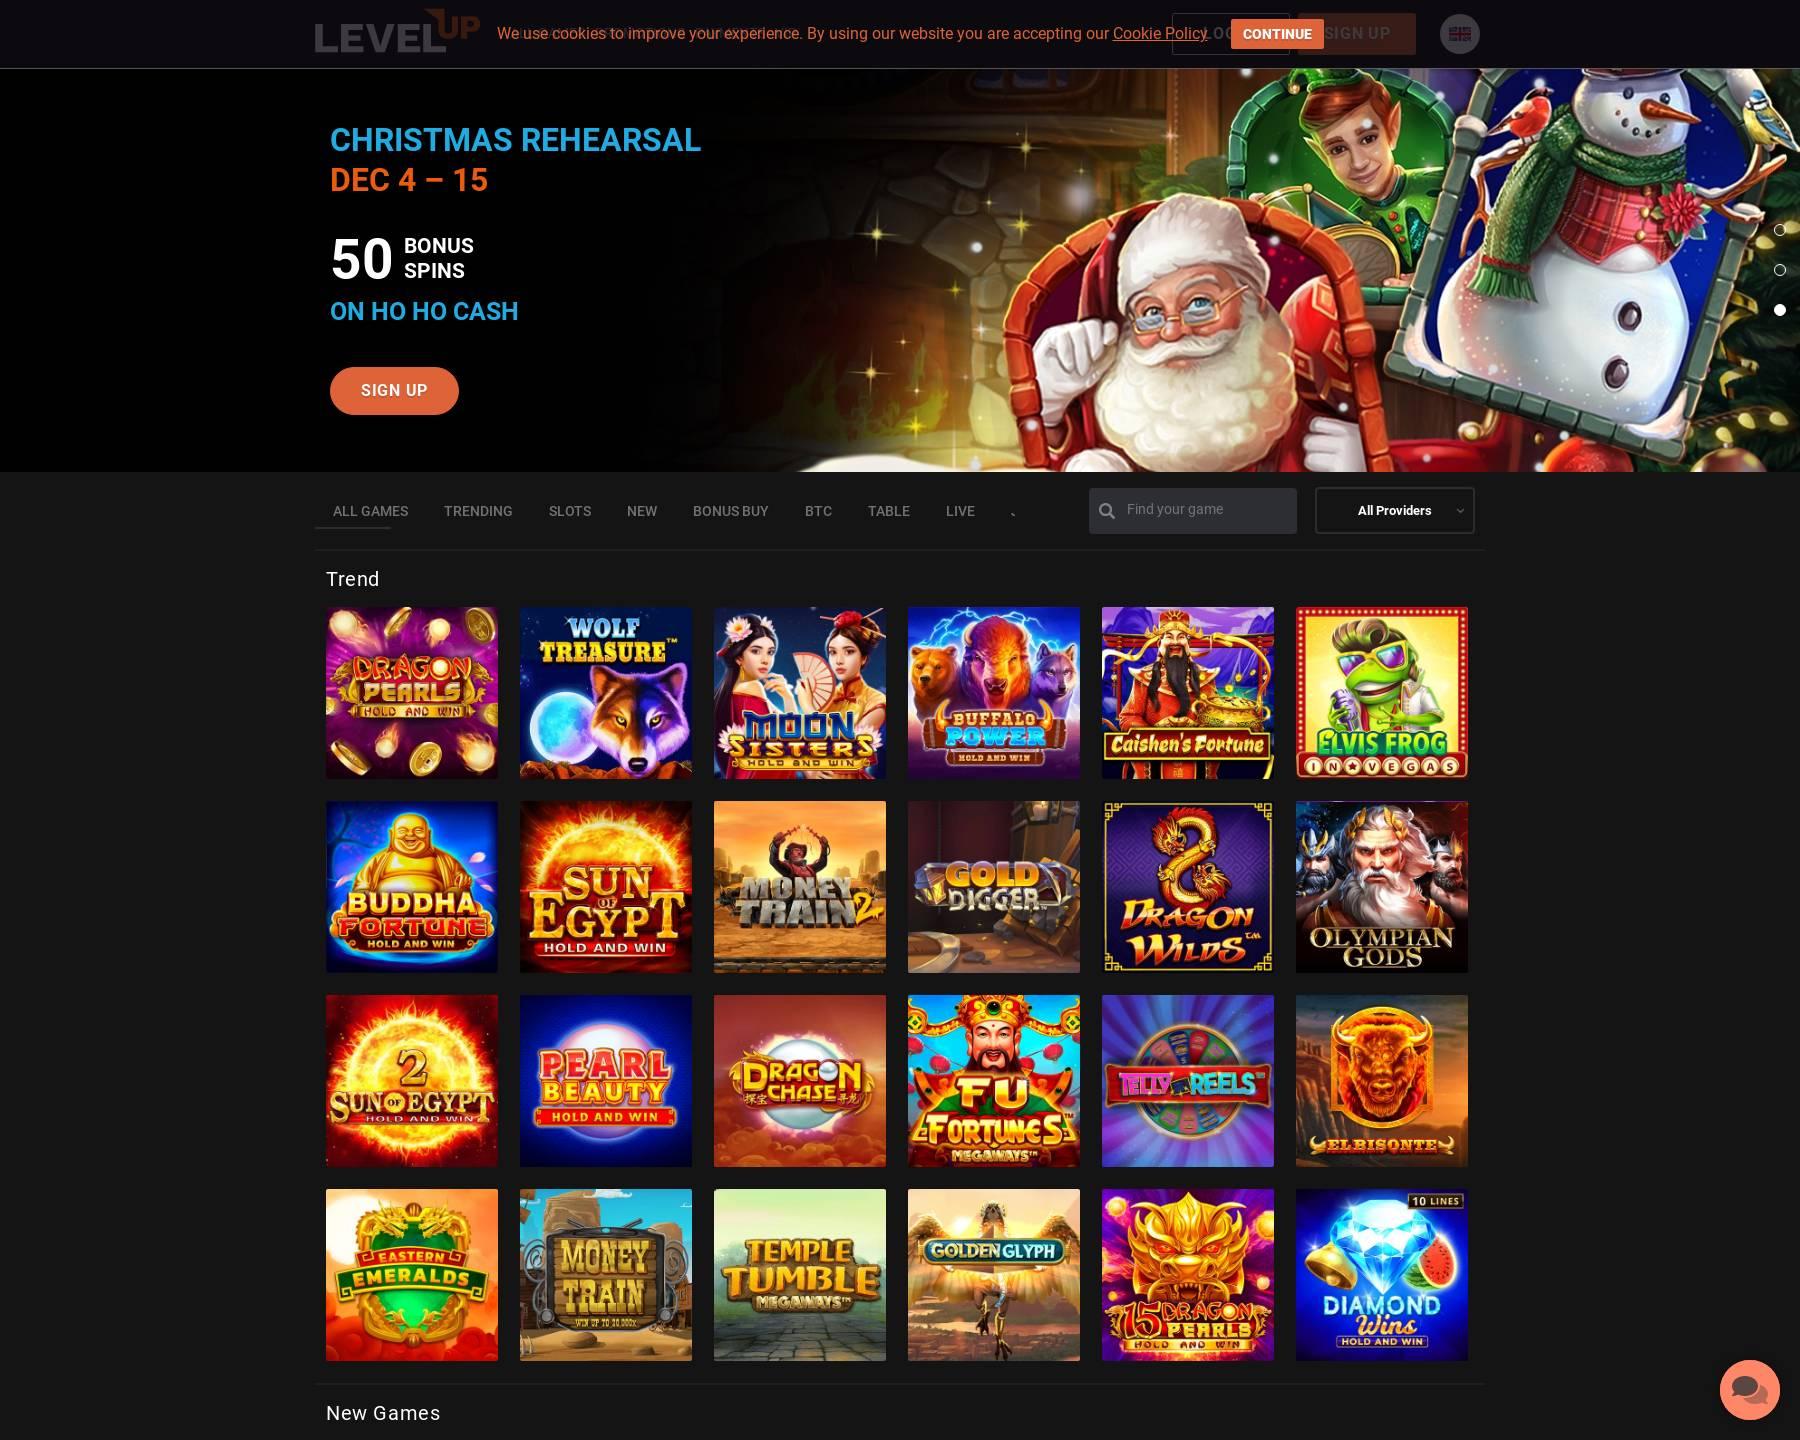 LevelUp Casino